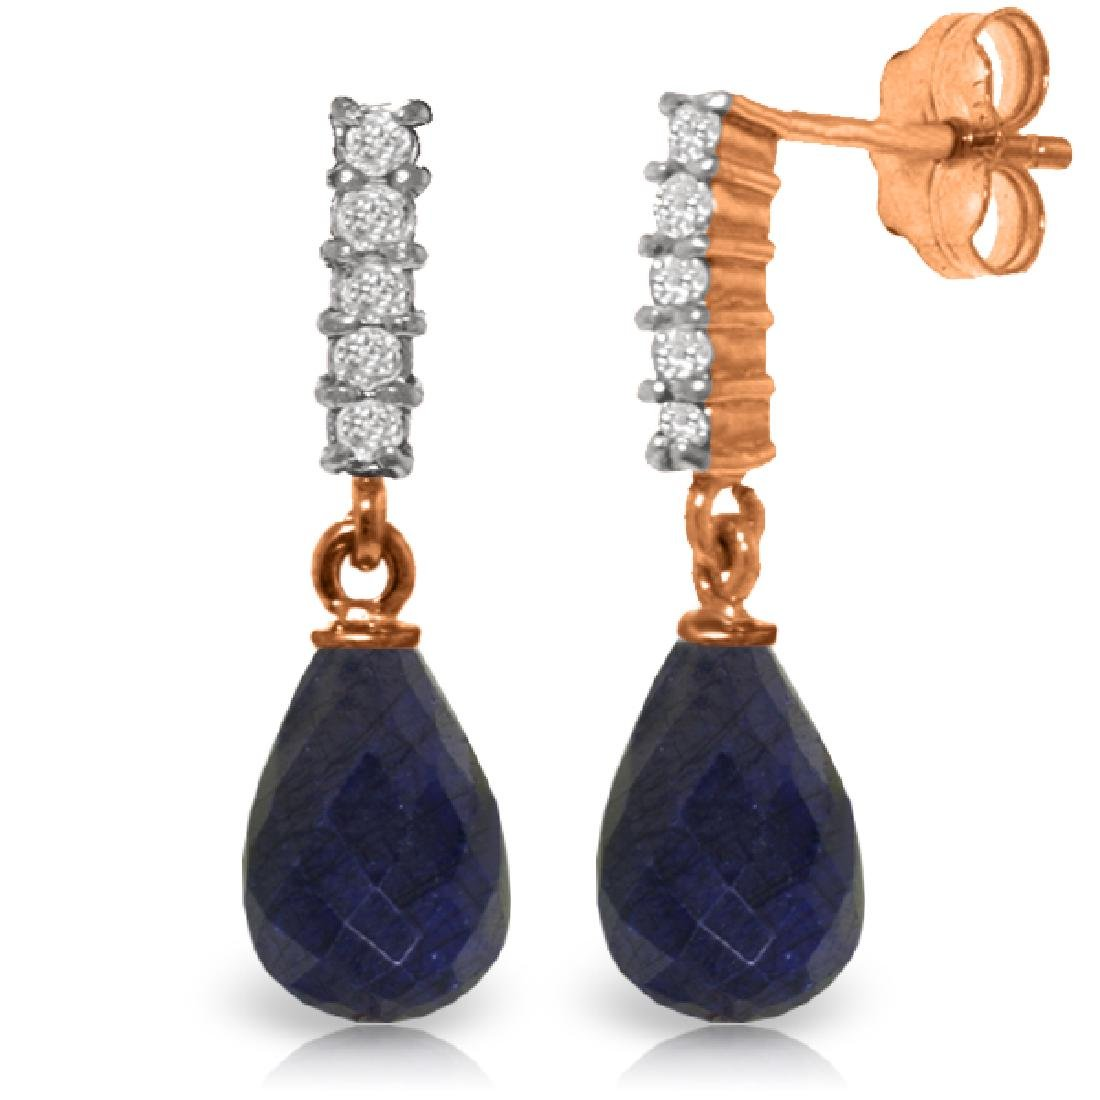 Genuine 6.75 ctw Sapphire & Diamond Earrings Jewelry